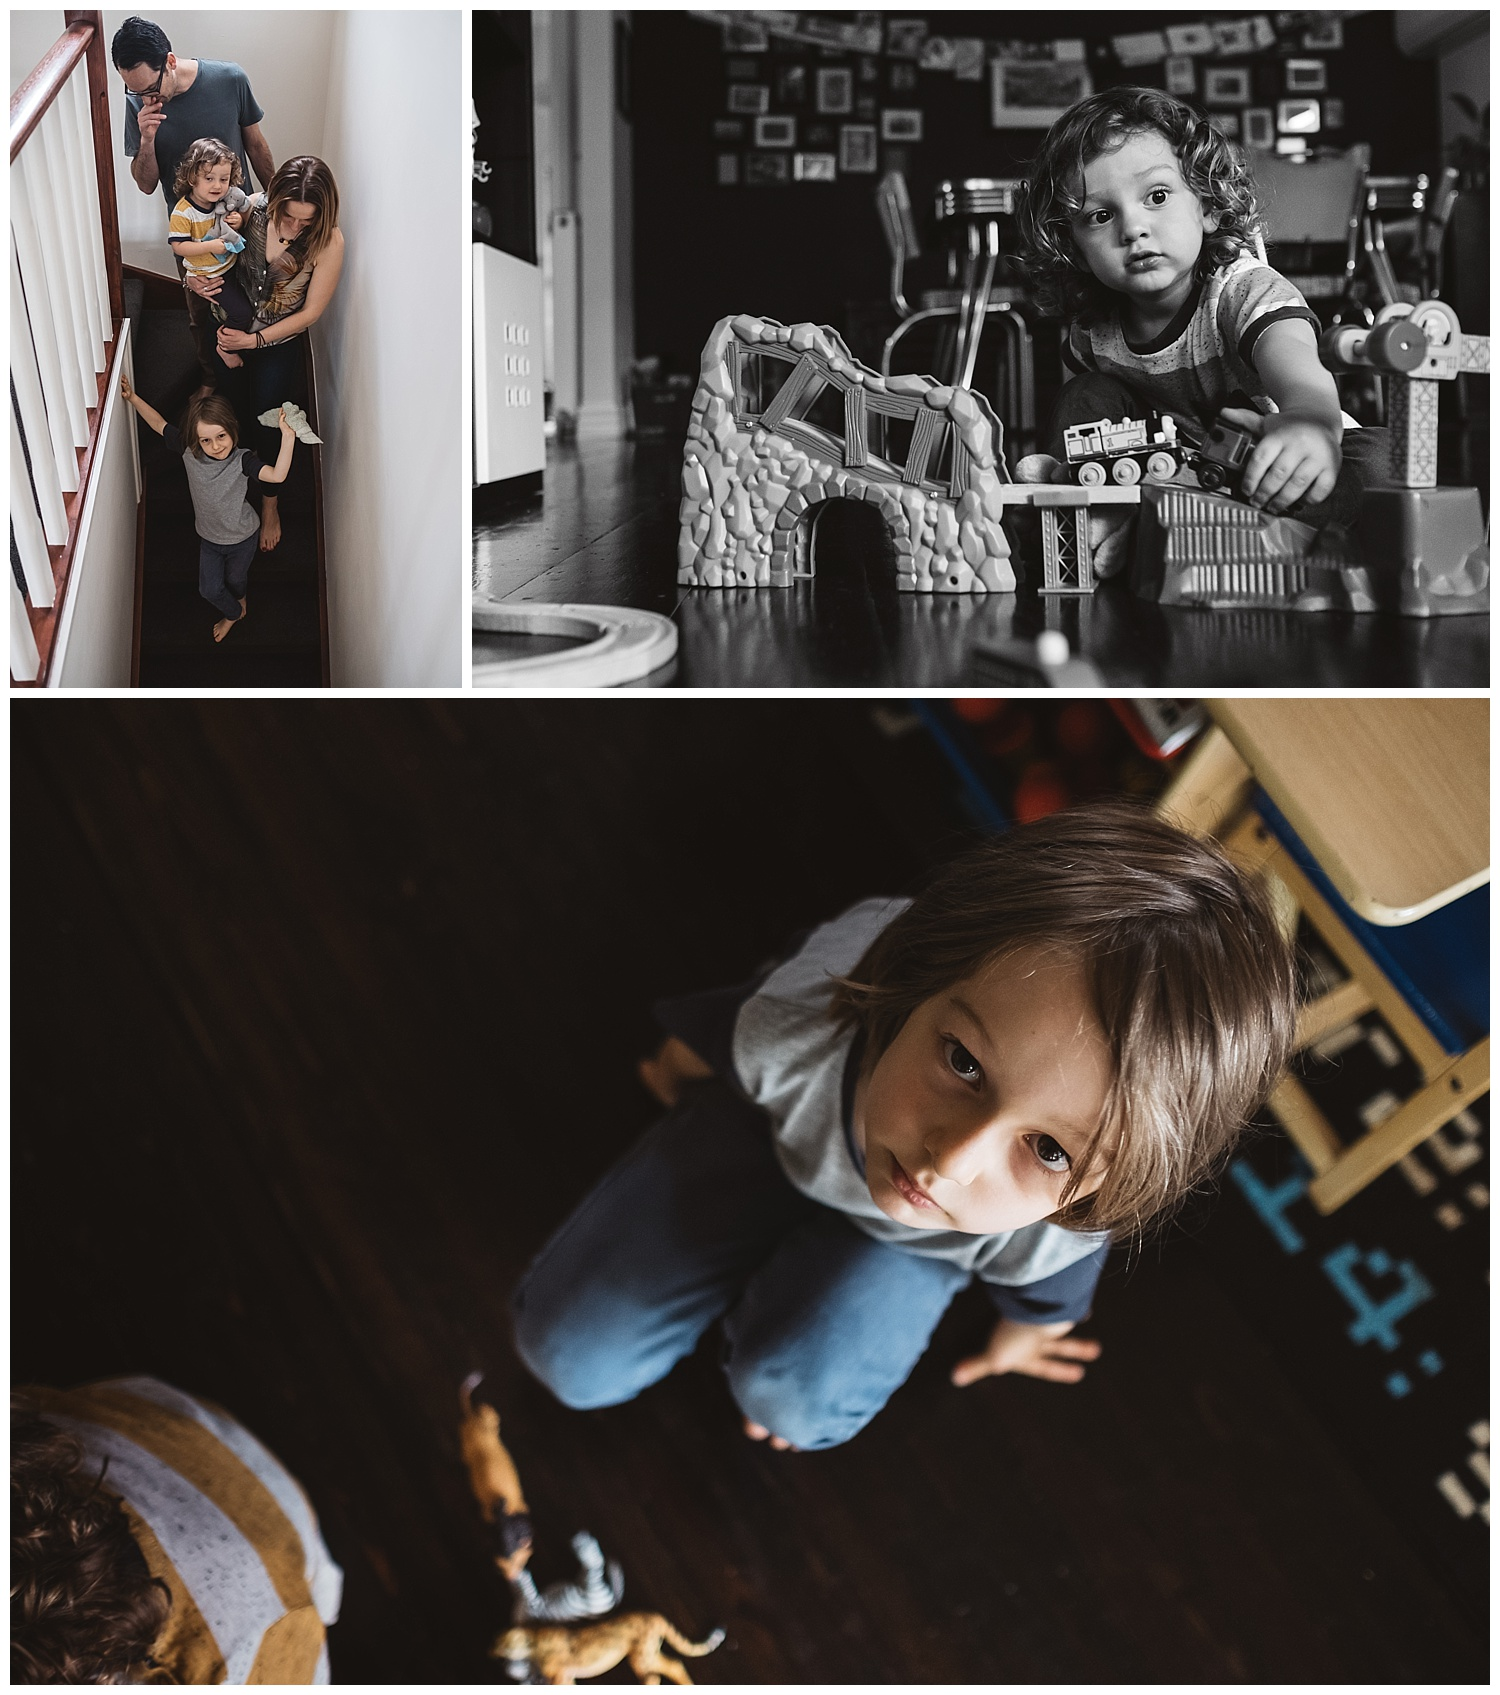 newborn photographer and family lifestyle photos in Brunswick